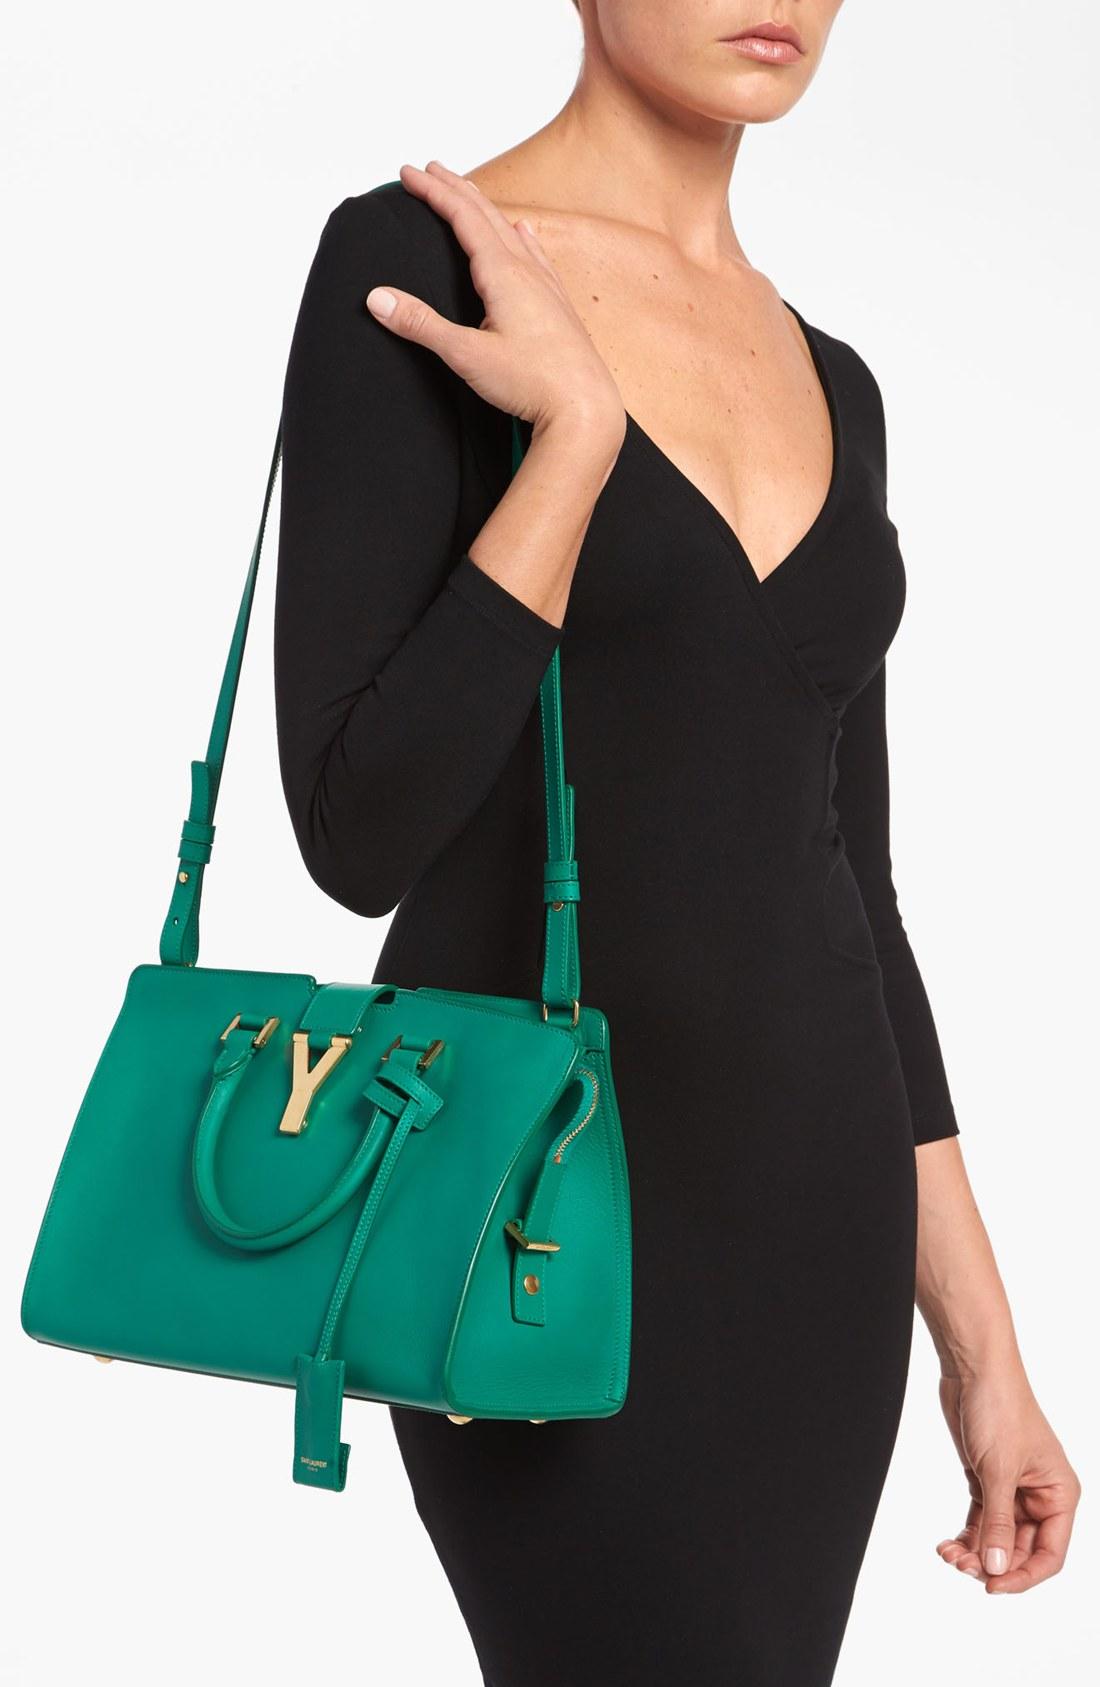 50e0bd14c1 ... Black saint laurent bags price - Saint laurent Petite Ligne Y Leather  Tote in Green (Emeraude Y Ligne Cuir Gras Mini Bag